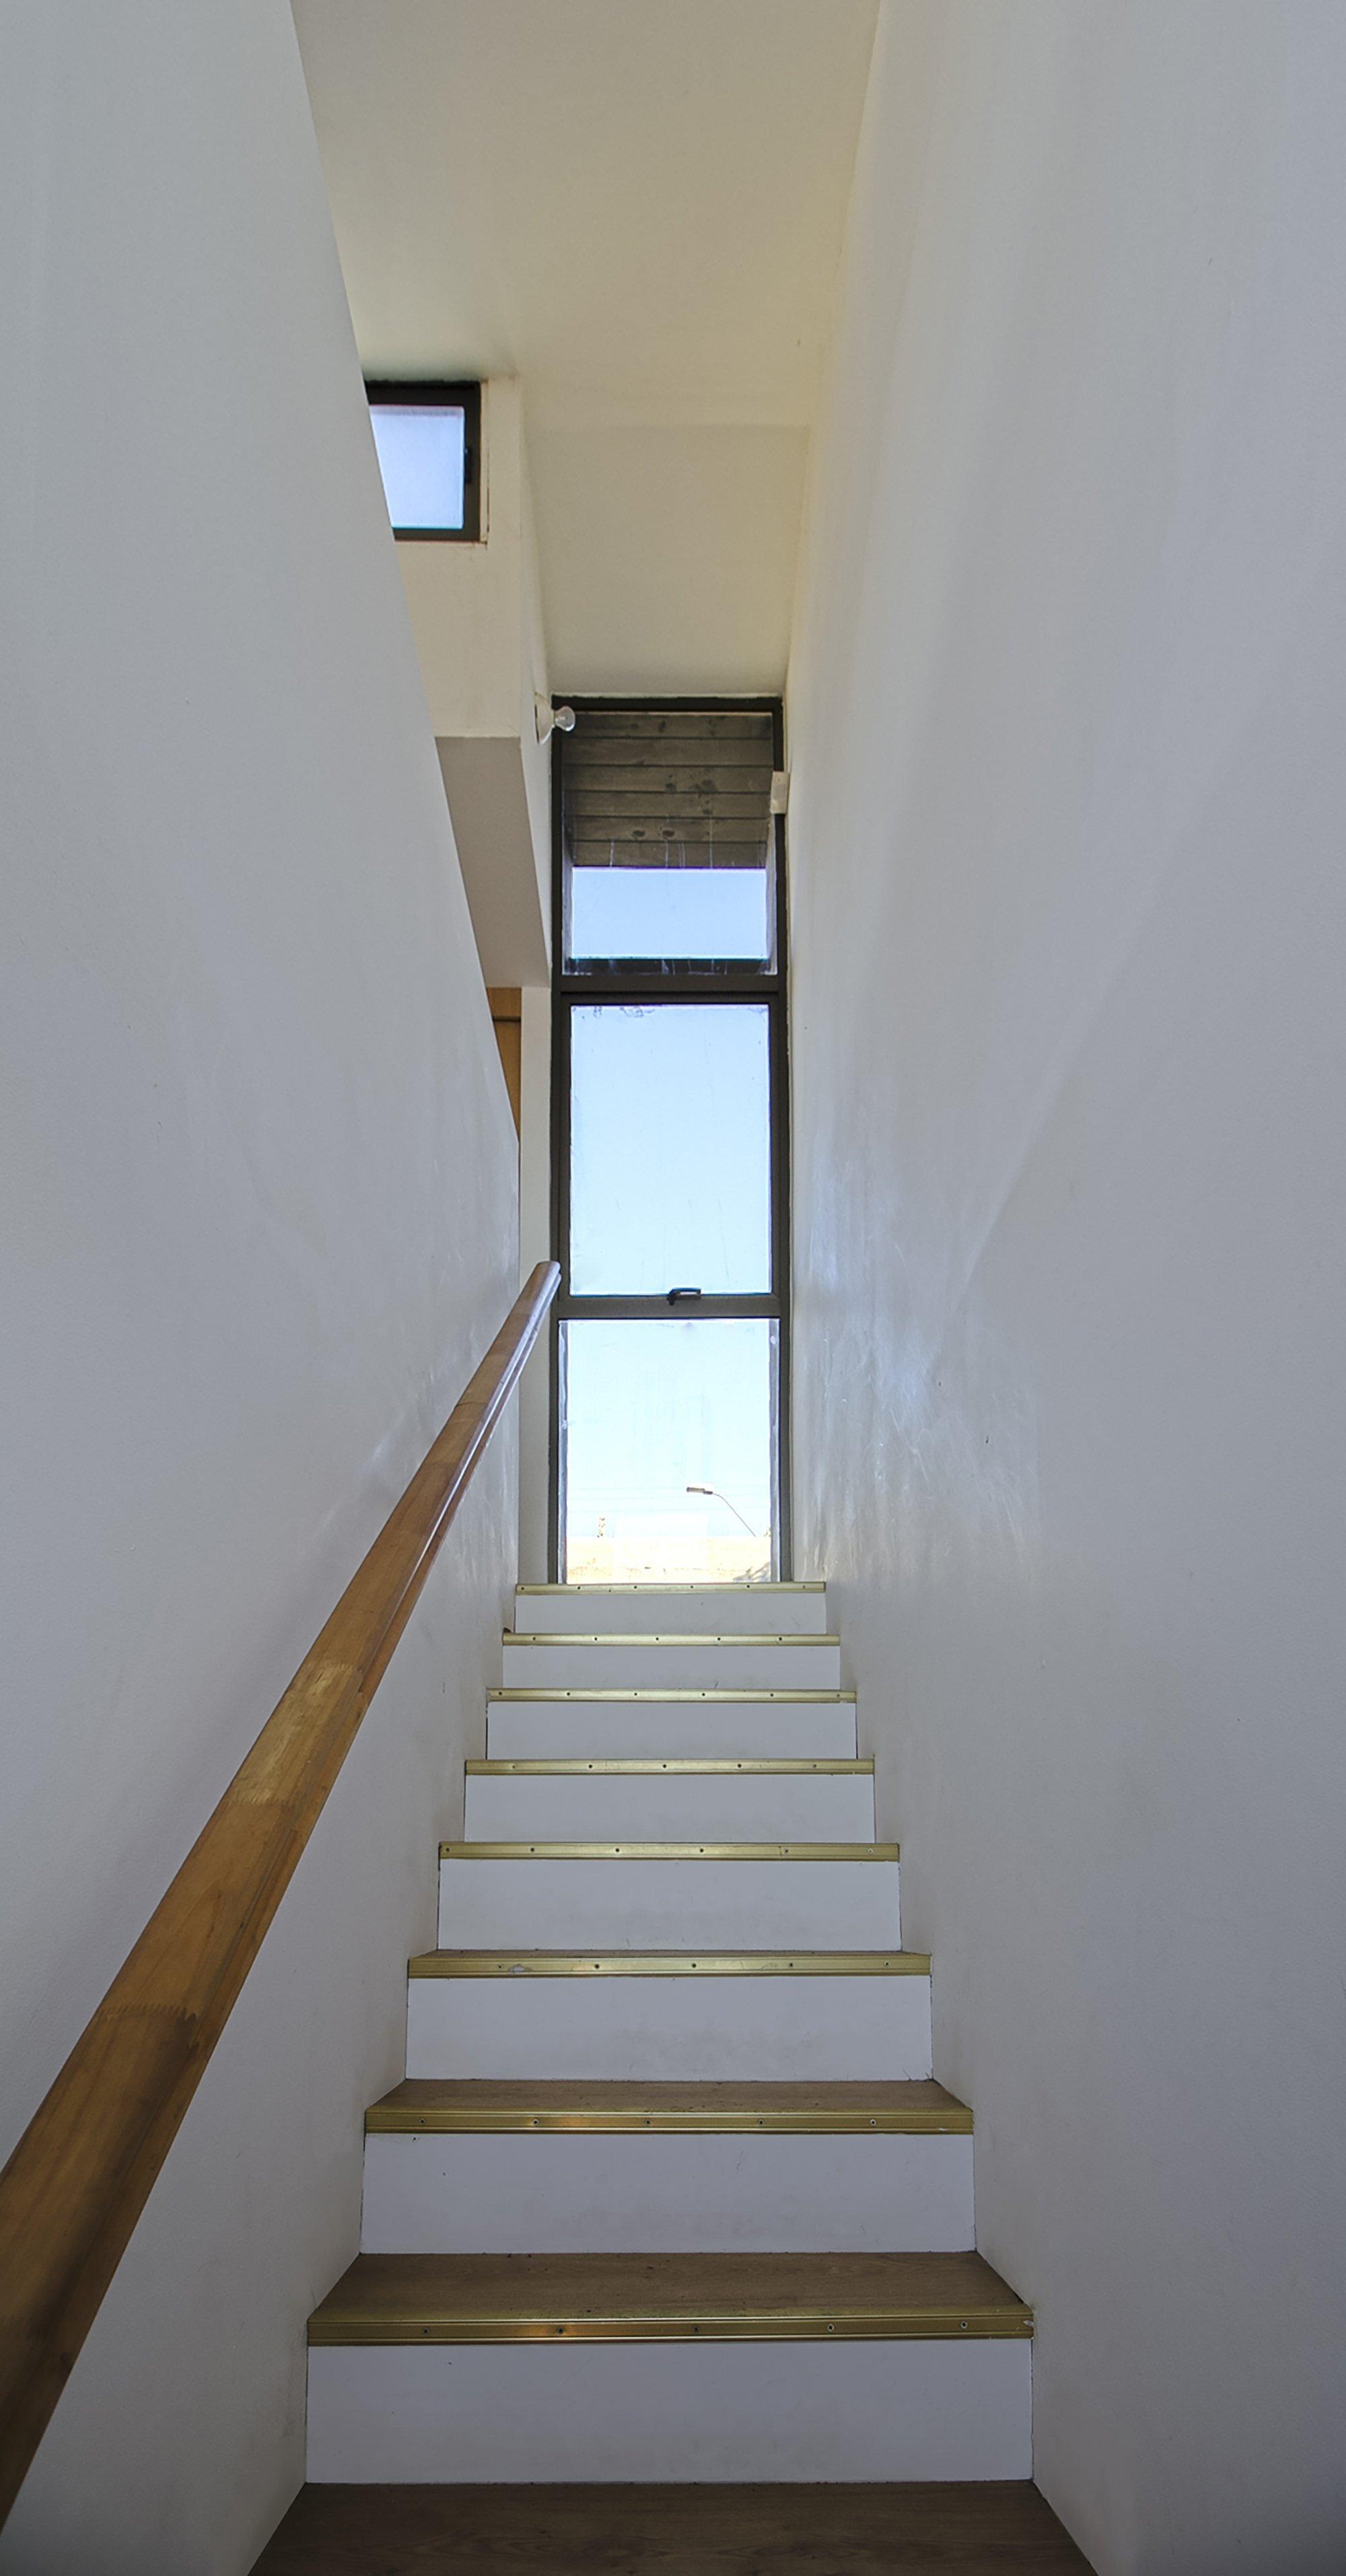 Coupled Wagon House - Crescente Böhme Alemparte - Chile - Staircase - Humble Homes